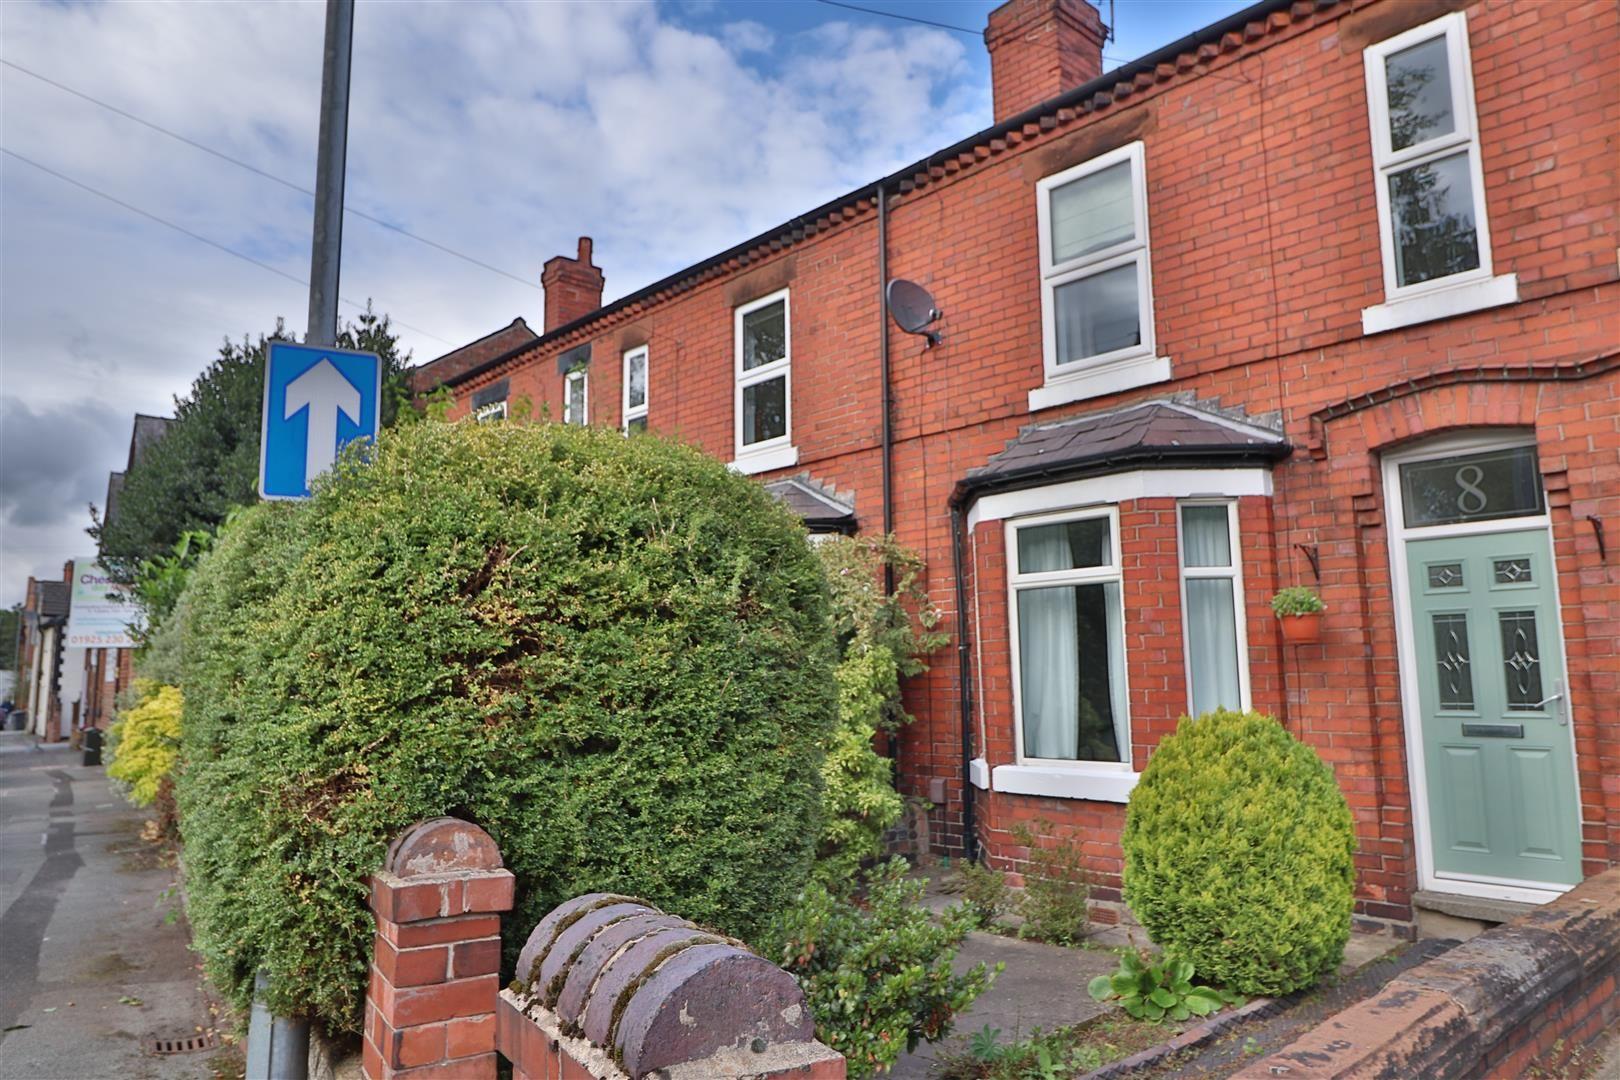 Property photo 1 of 10. Img_9916.Jpg